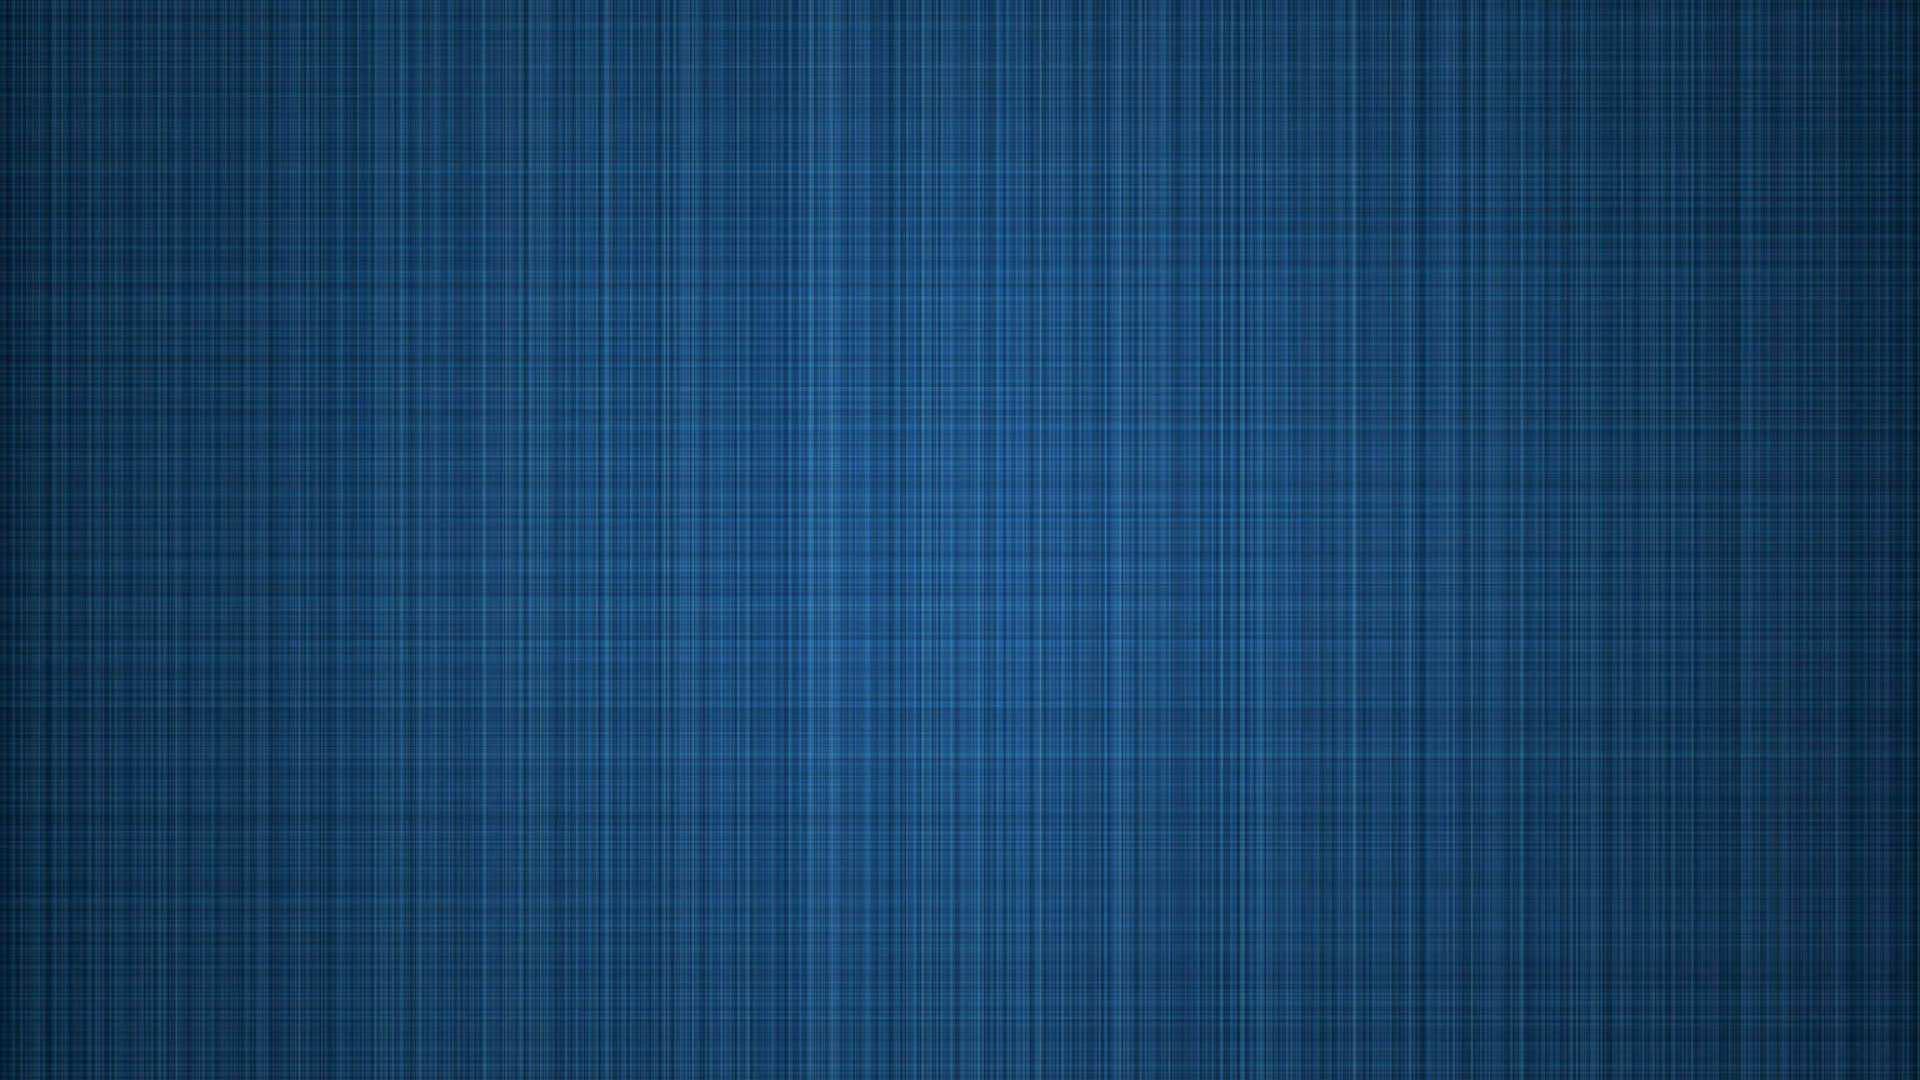 blue pattern wallpaper background